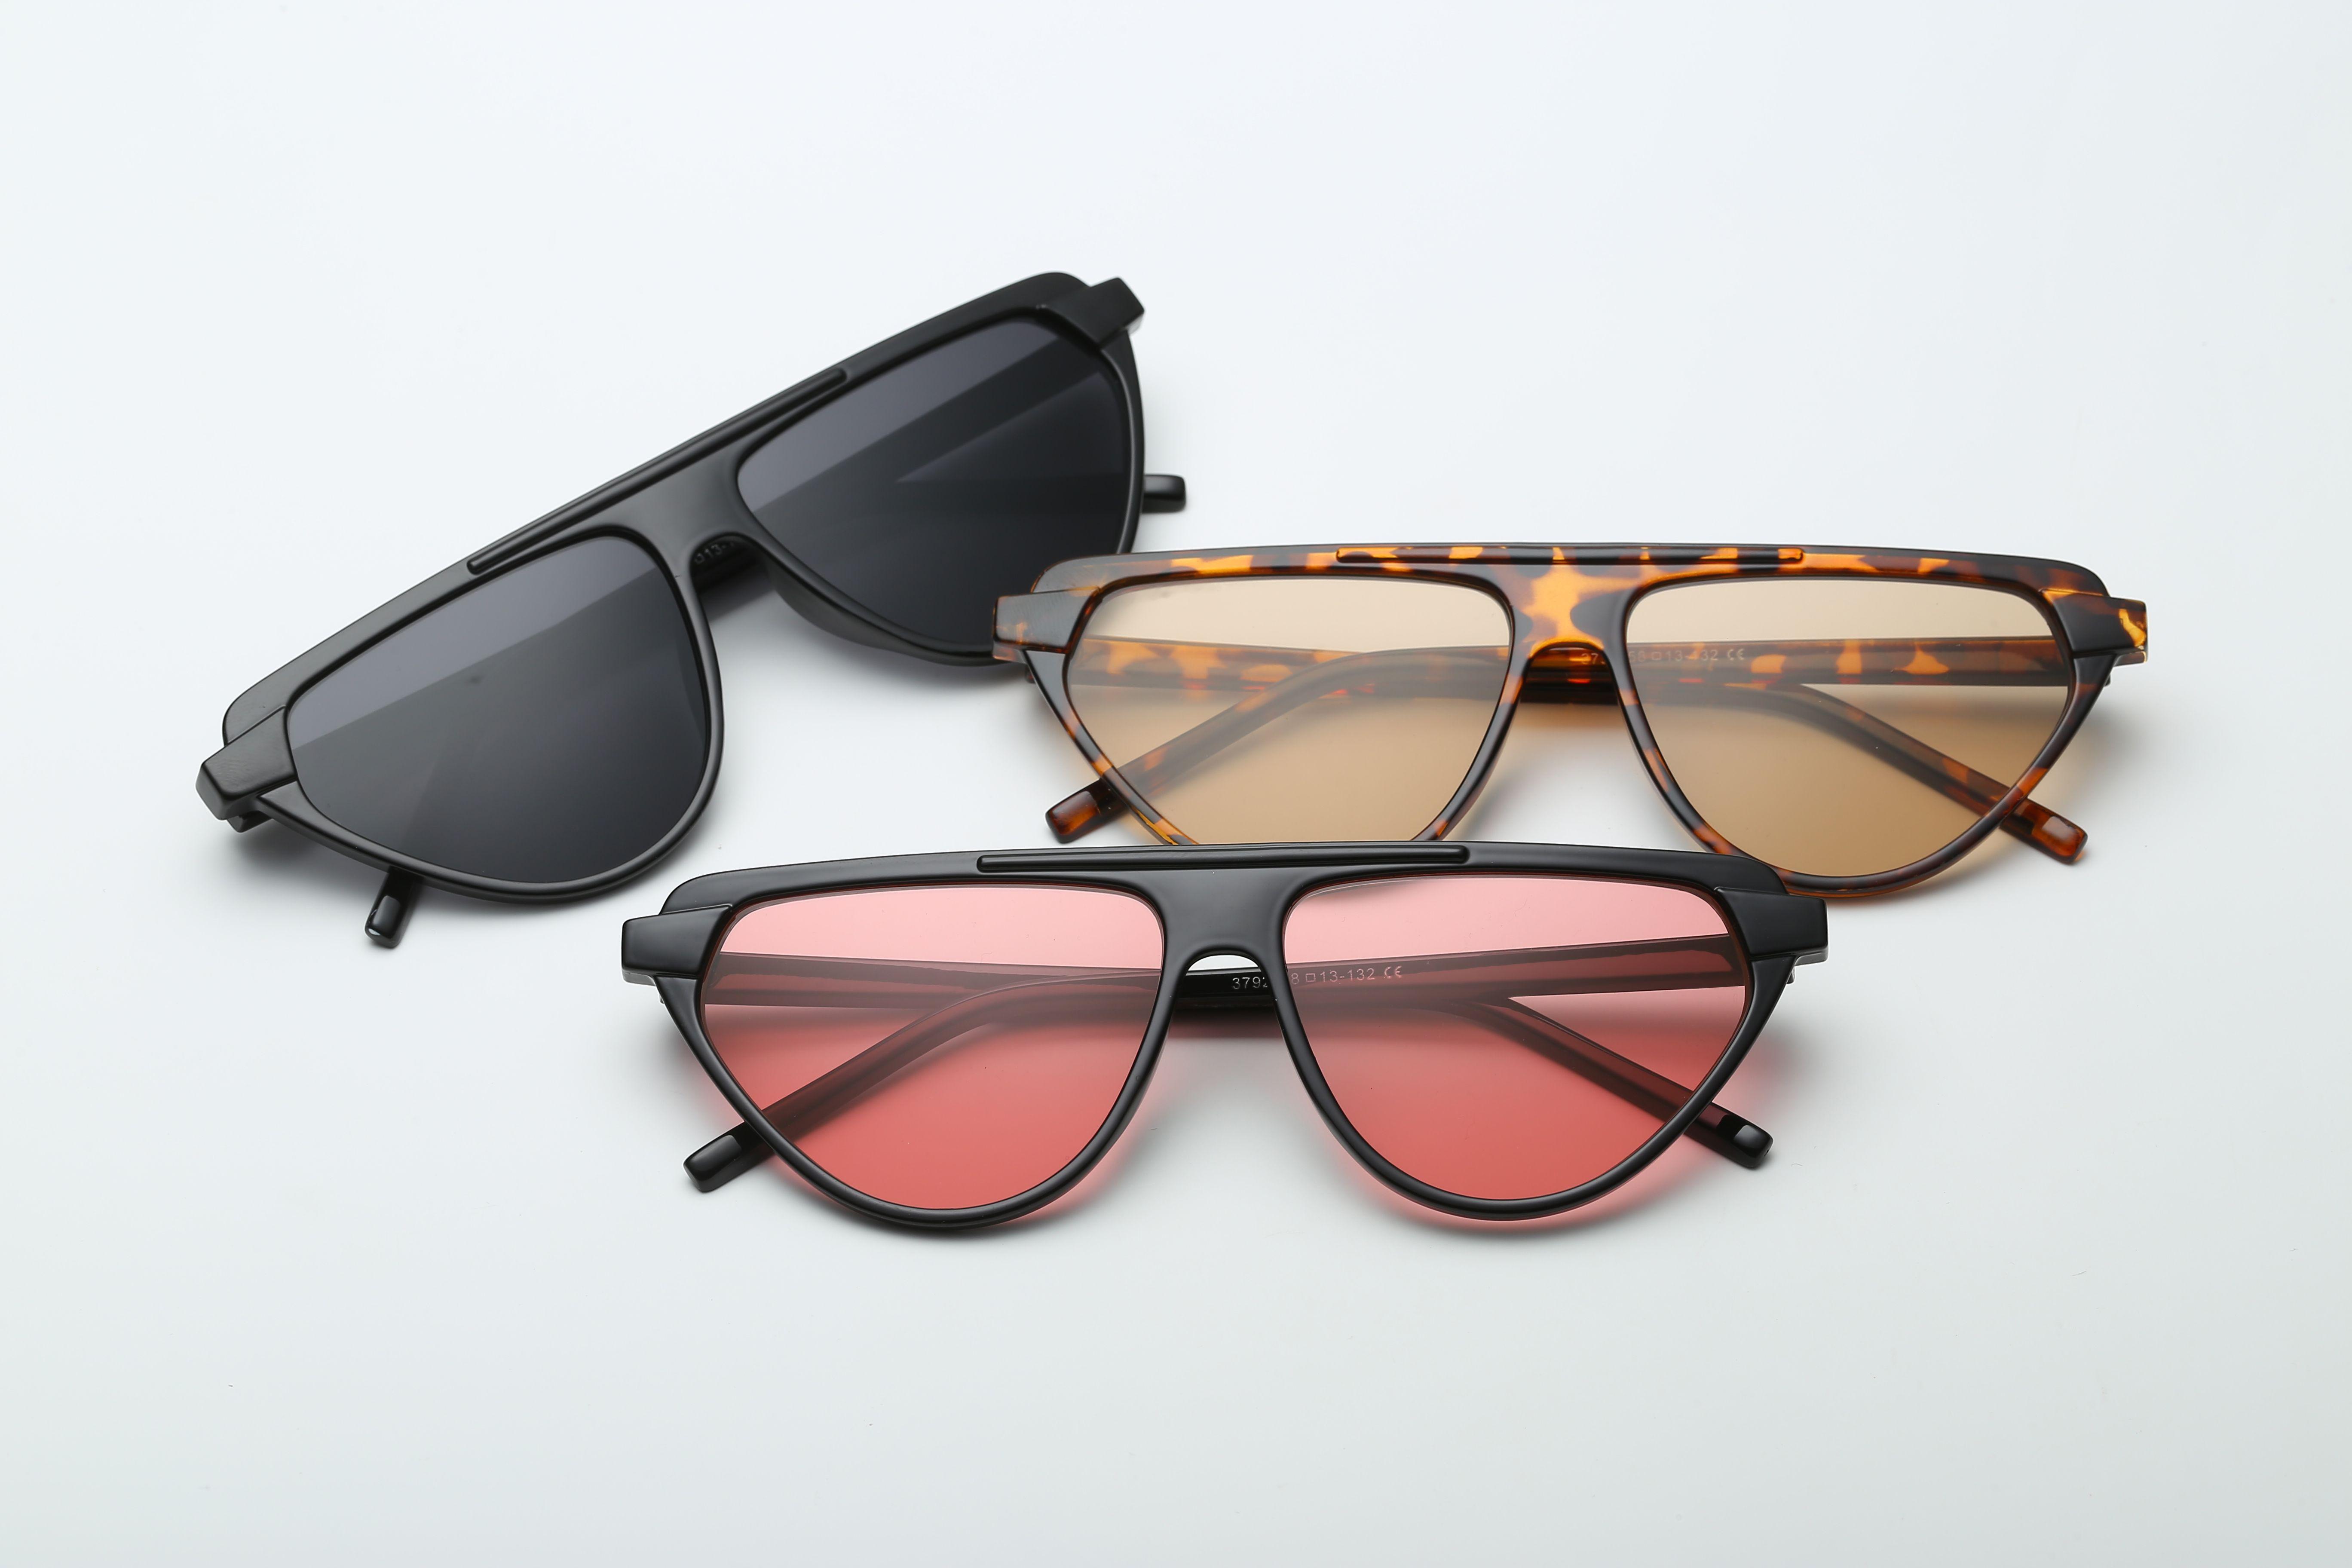 f0cc5341006 Cheap Sunglasses Limited Edition Best Sunglasses Acetates Manufacturer